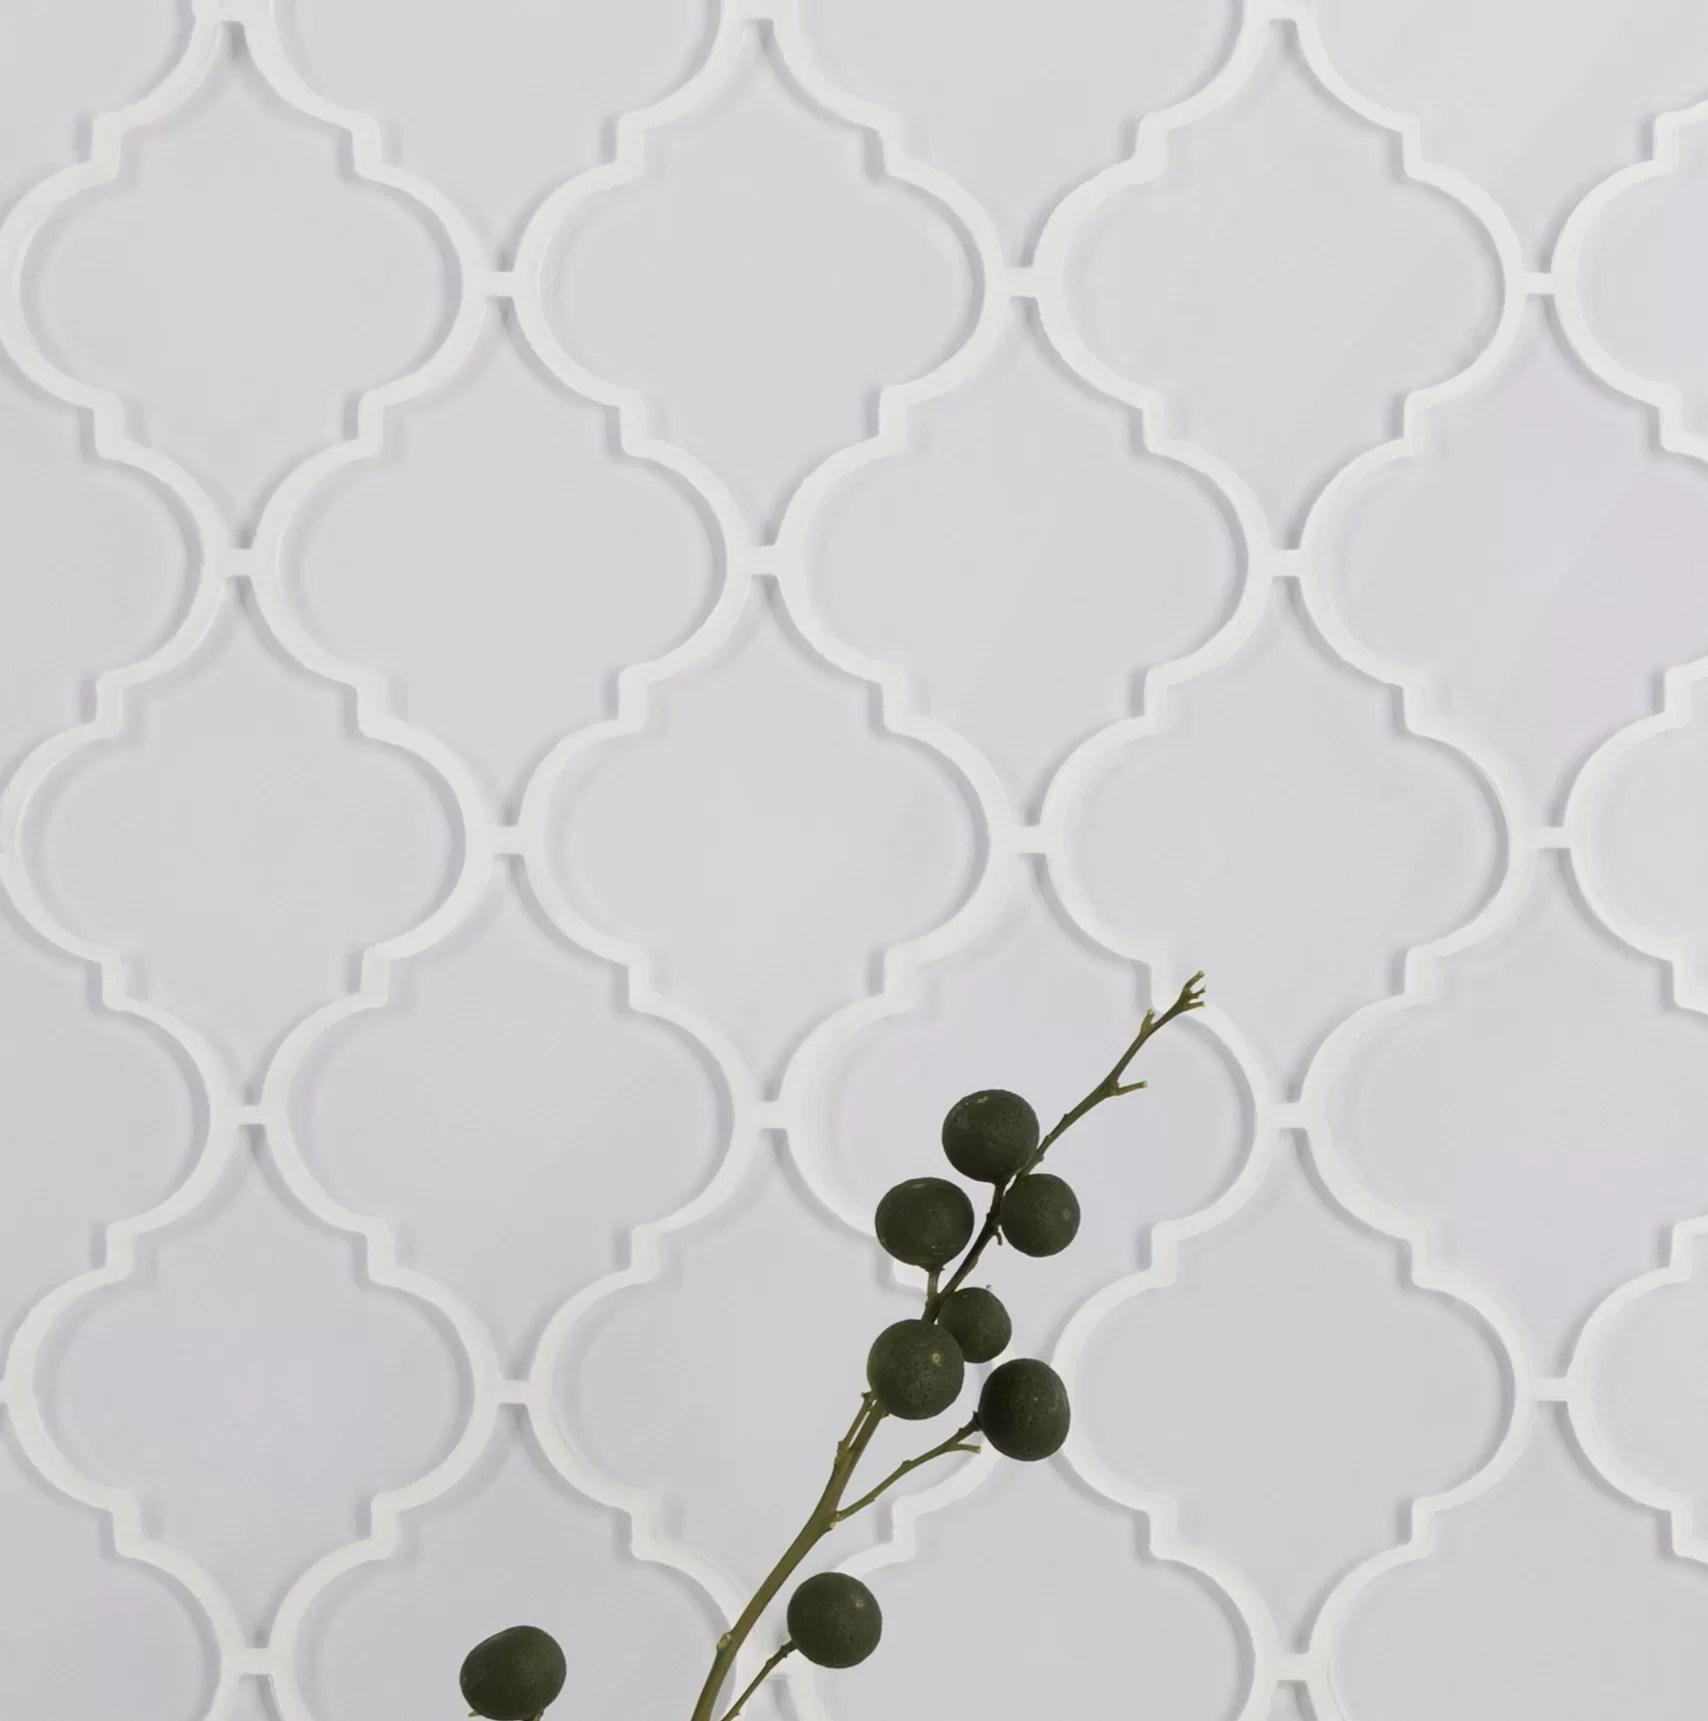 water jet series 3 x 4 glass arabesque mosaic tile